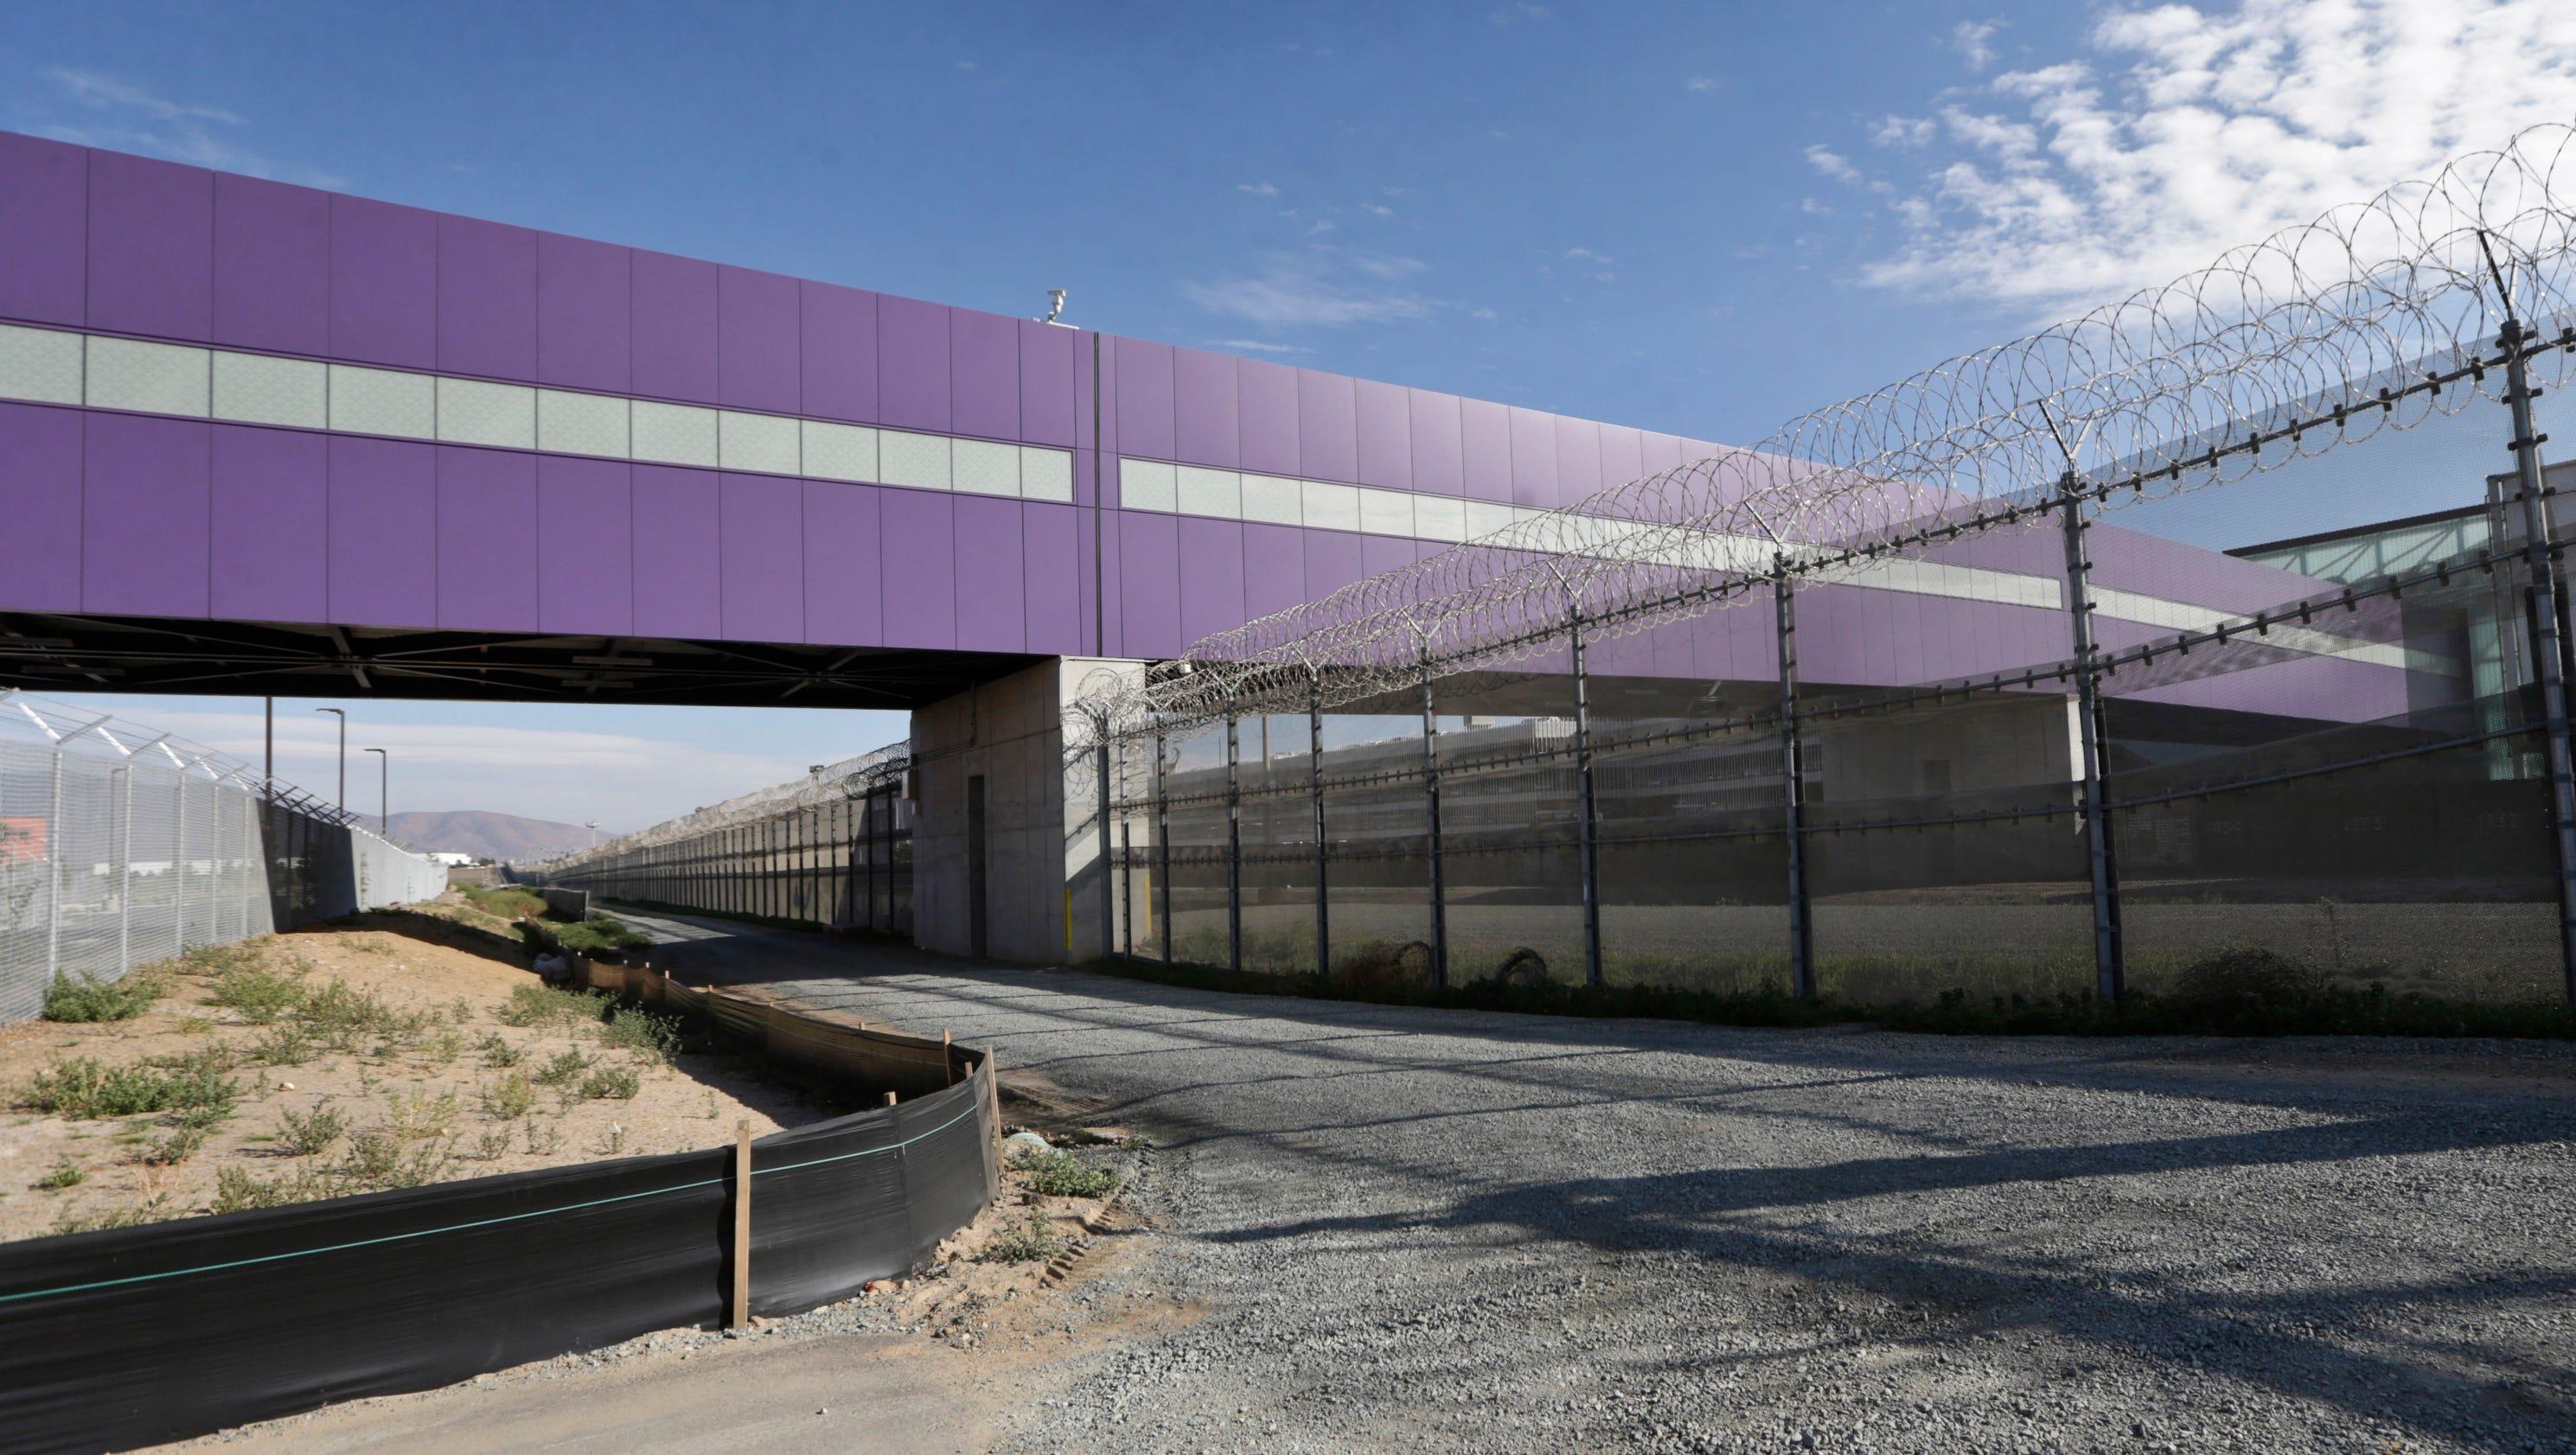 Cross border airport new california terminal extends to mexico sciox Gallery